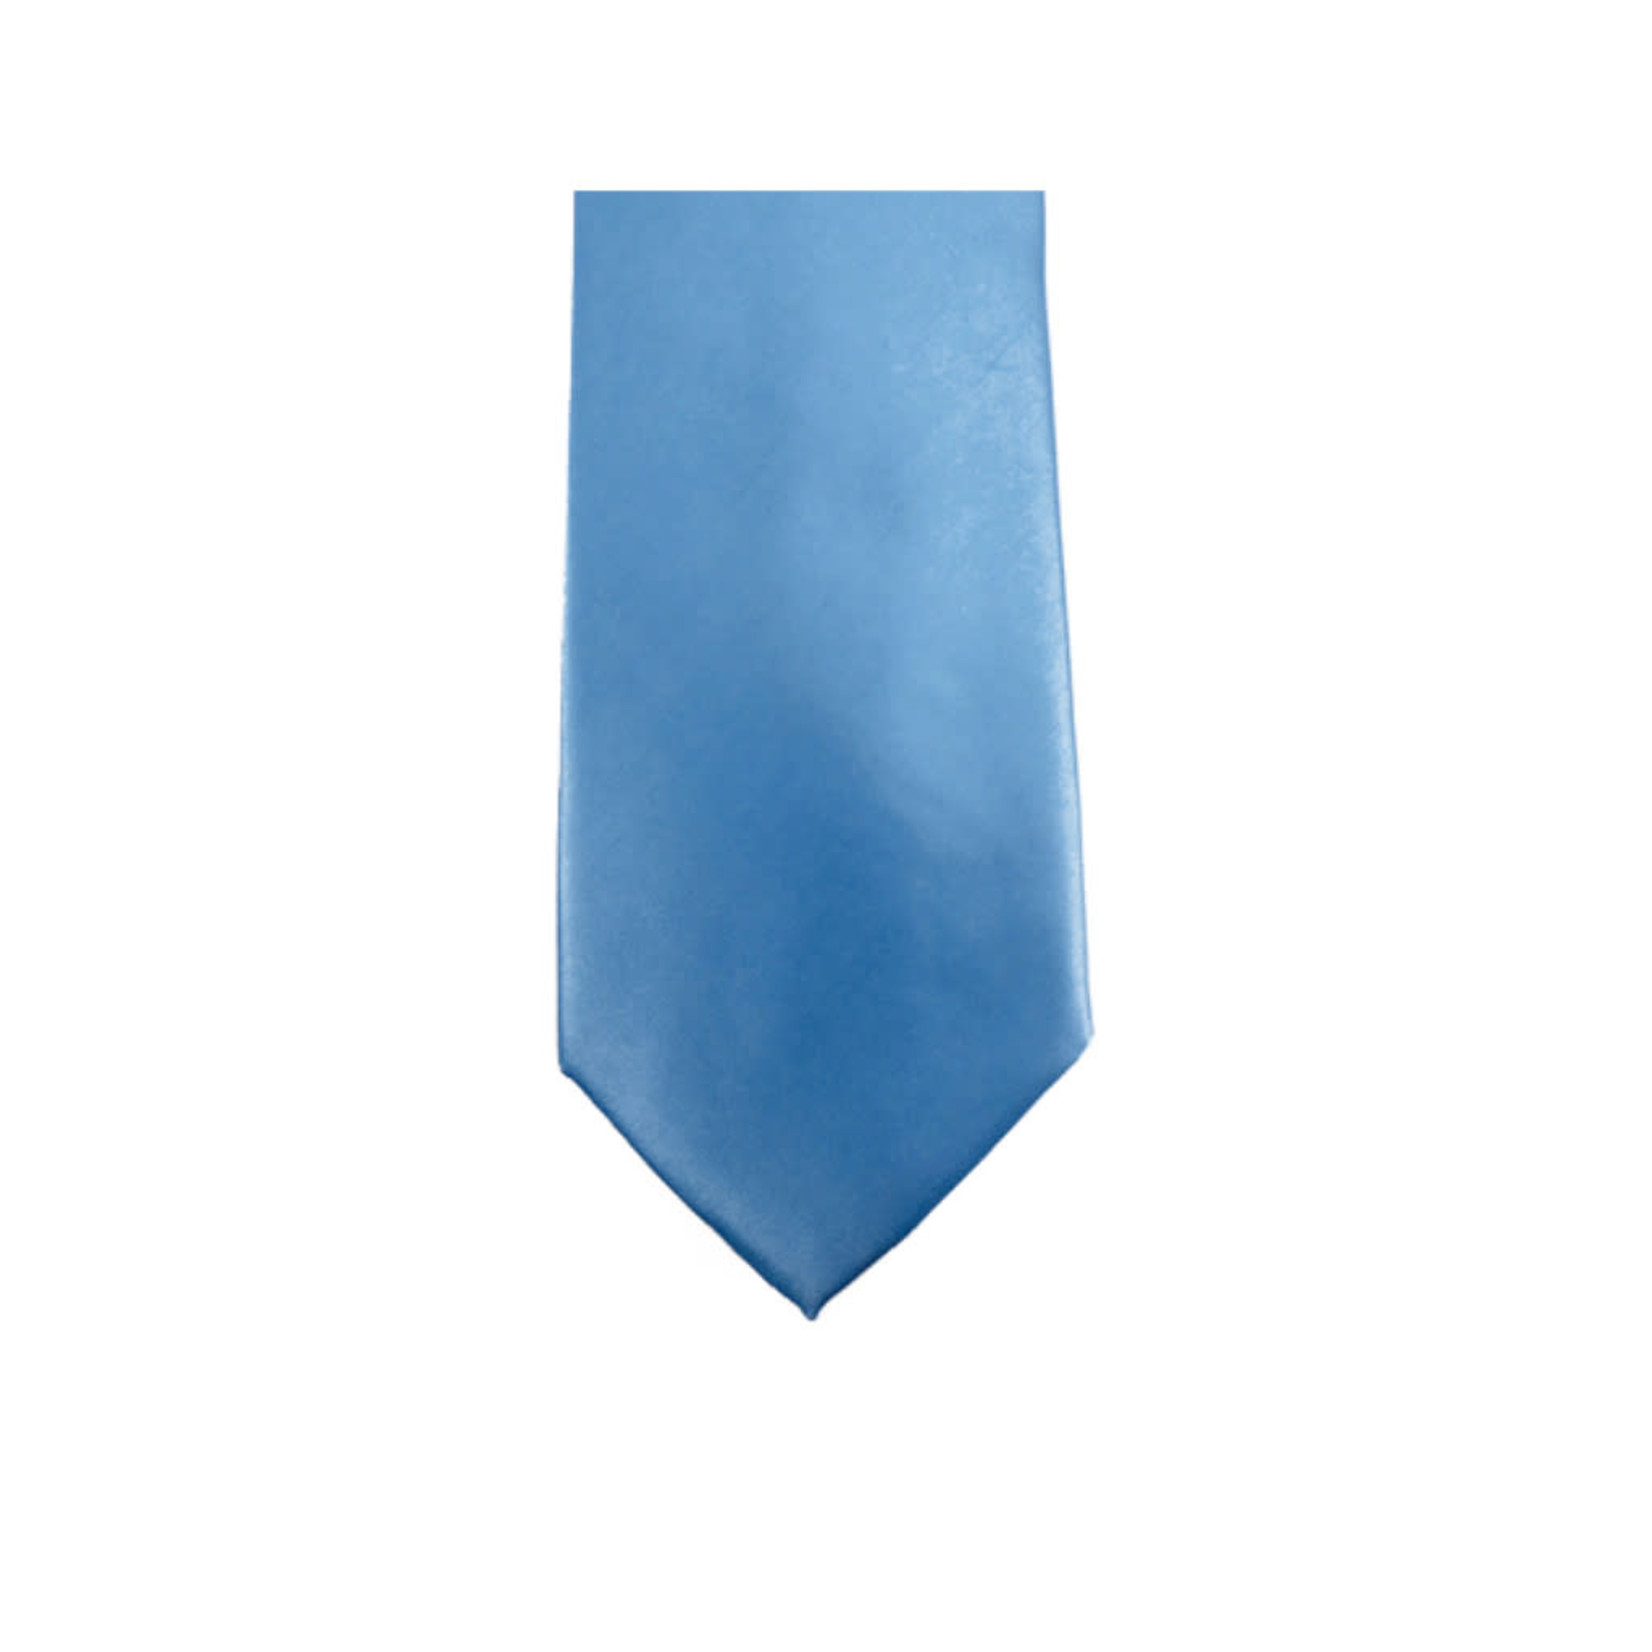 Knotz M100-12 Solid Blue Tie